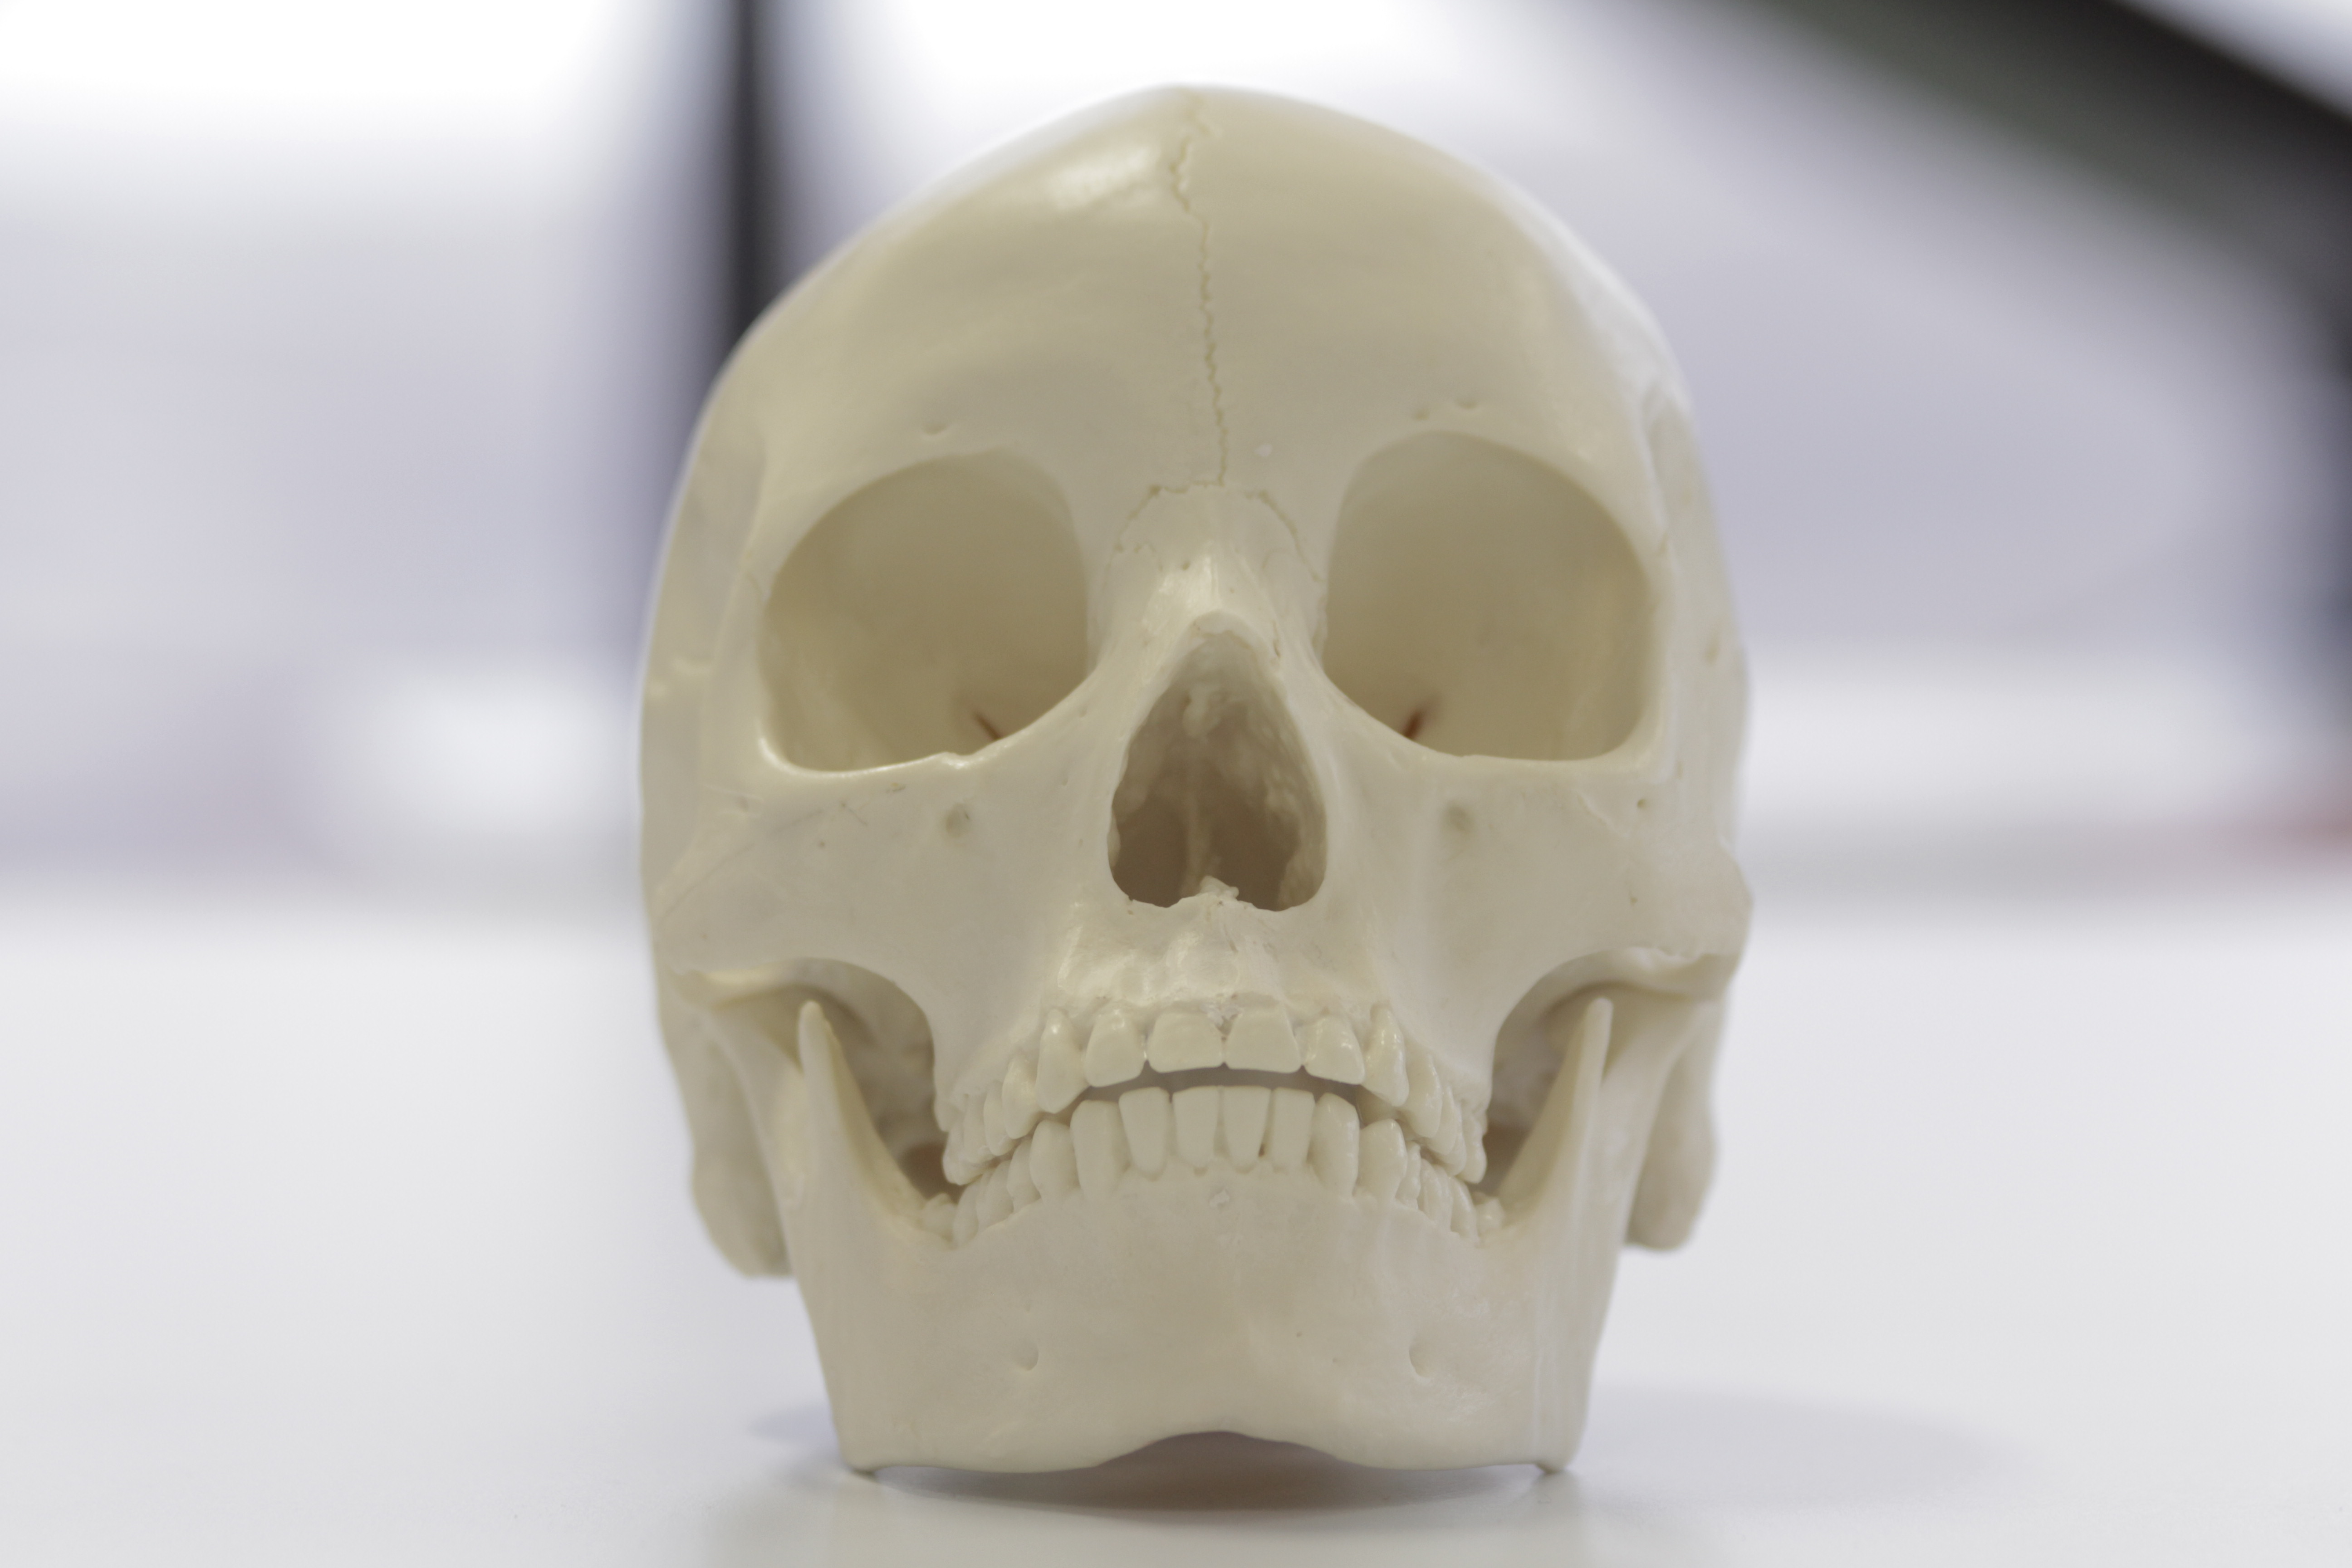 An Asian skull skull showing 'heart-shaped' nasal aperture